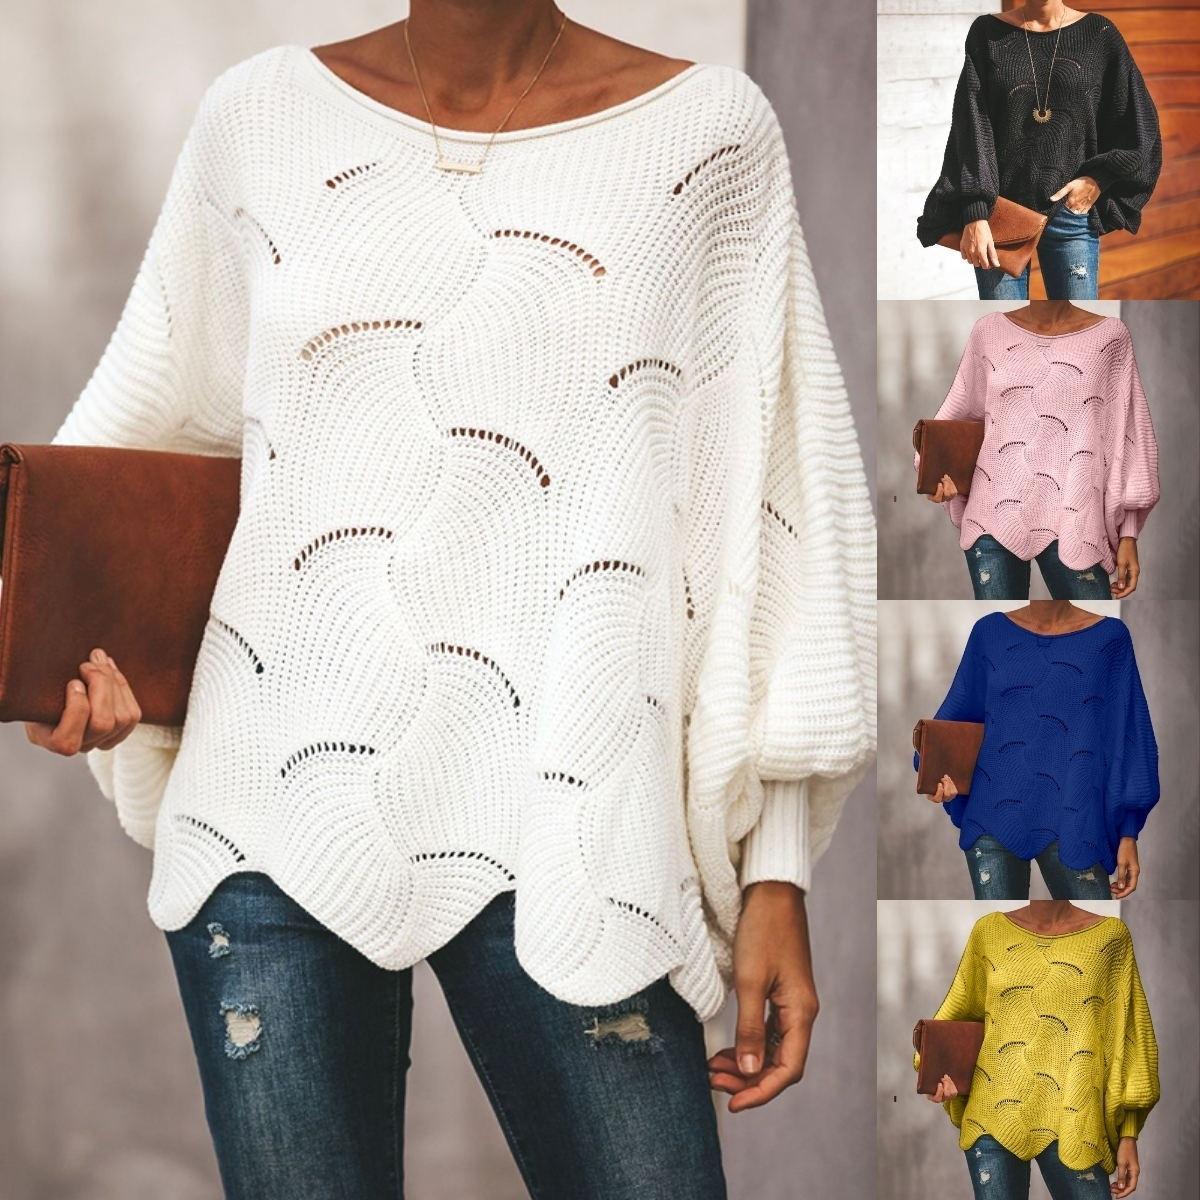 Camisola solta feminina capa casual oversized macio lanterna manga oco para fora pullovers malha o pescoço onda hem sólidos blusas femininas